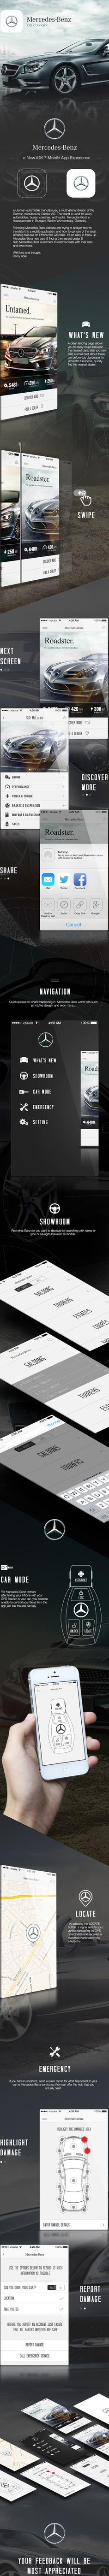 Mercedes-Benz iOS7 App Concept by Ramy Adel, via Behance